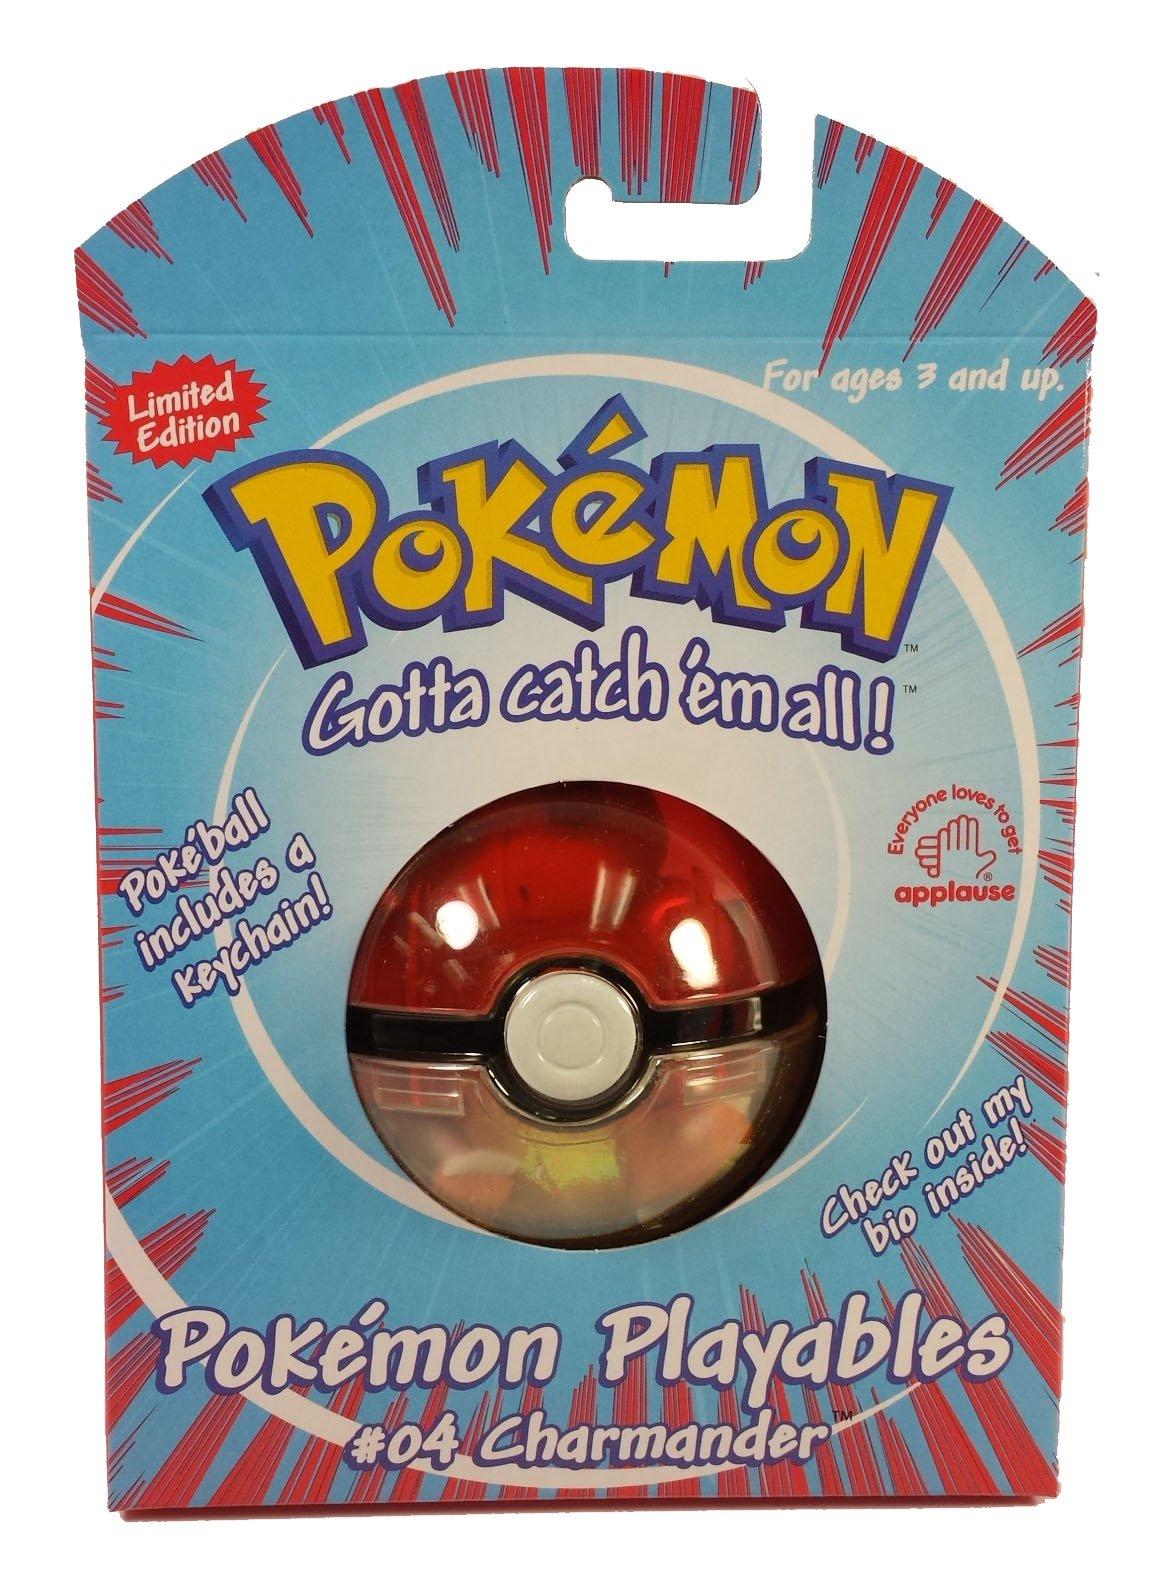 POKEMON Playables #04 Charmander Pokeball with Keychain